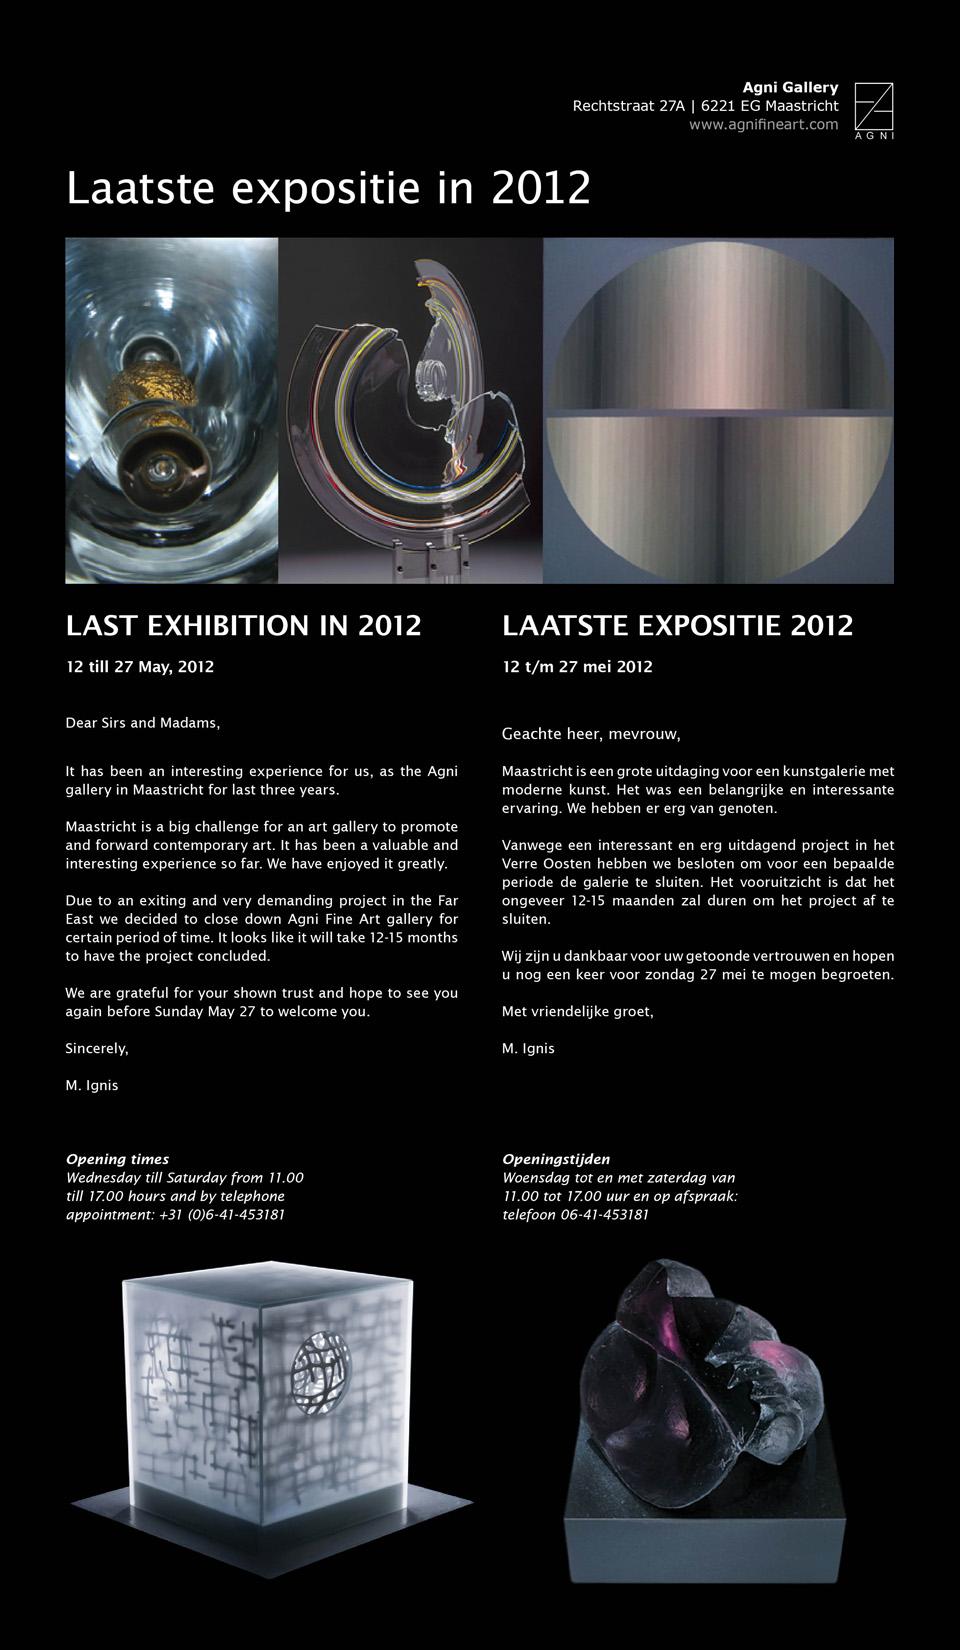 Last Exposition 2012